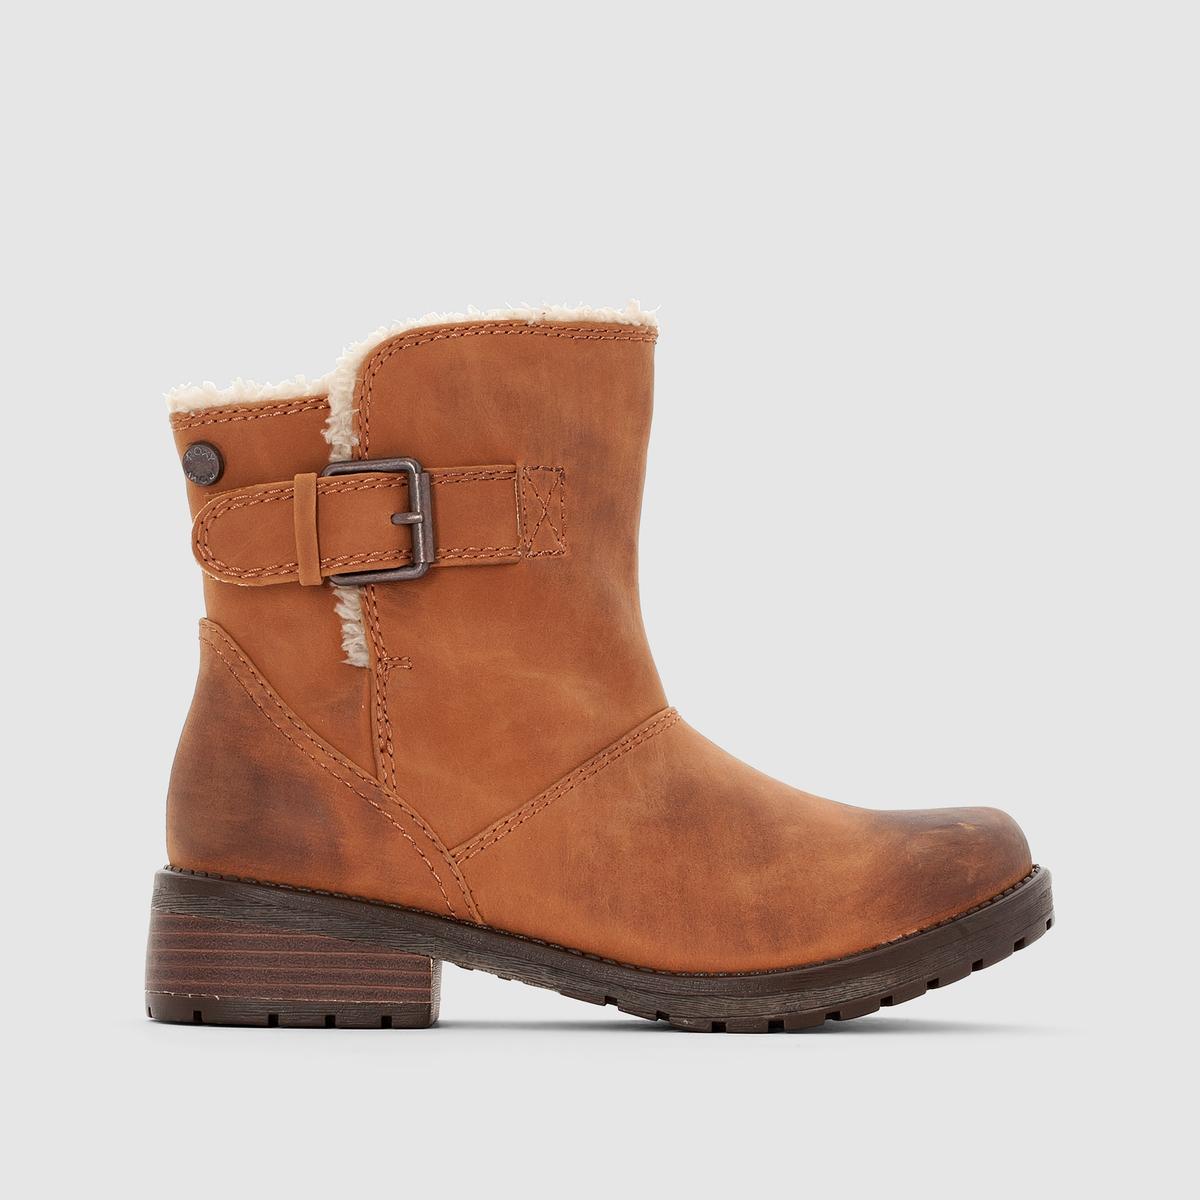 Ботинки Castro J Boot Tan ботинки roxy timber j boot brn